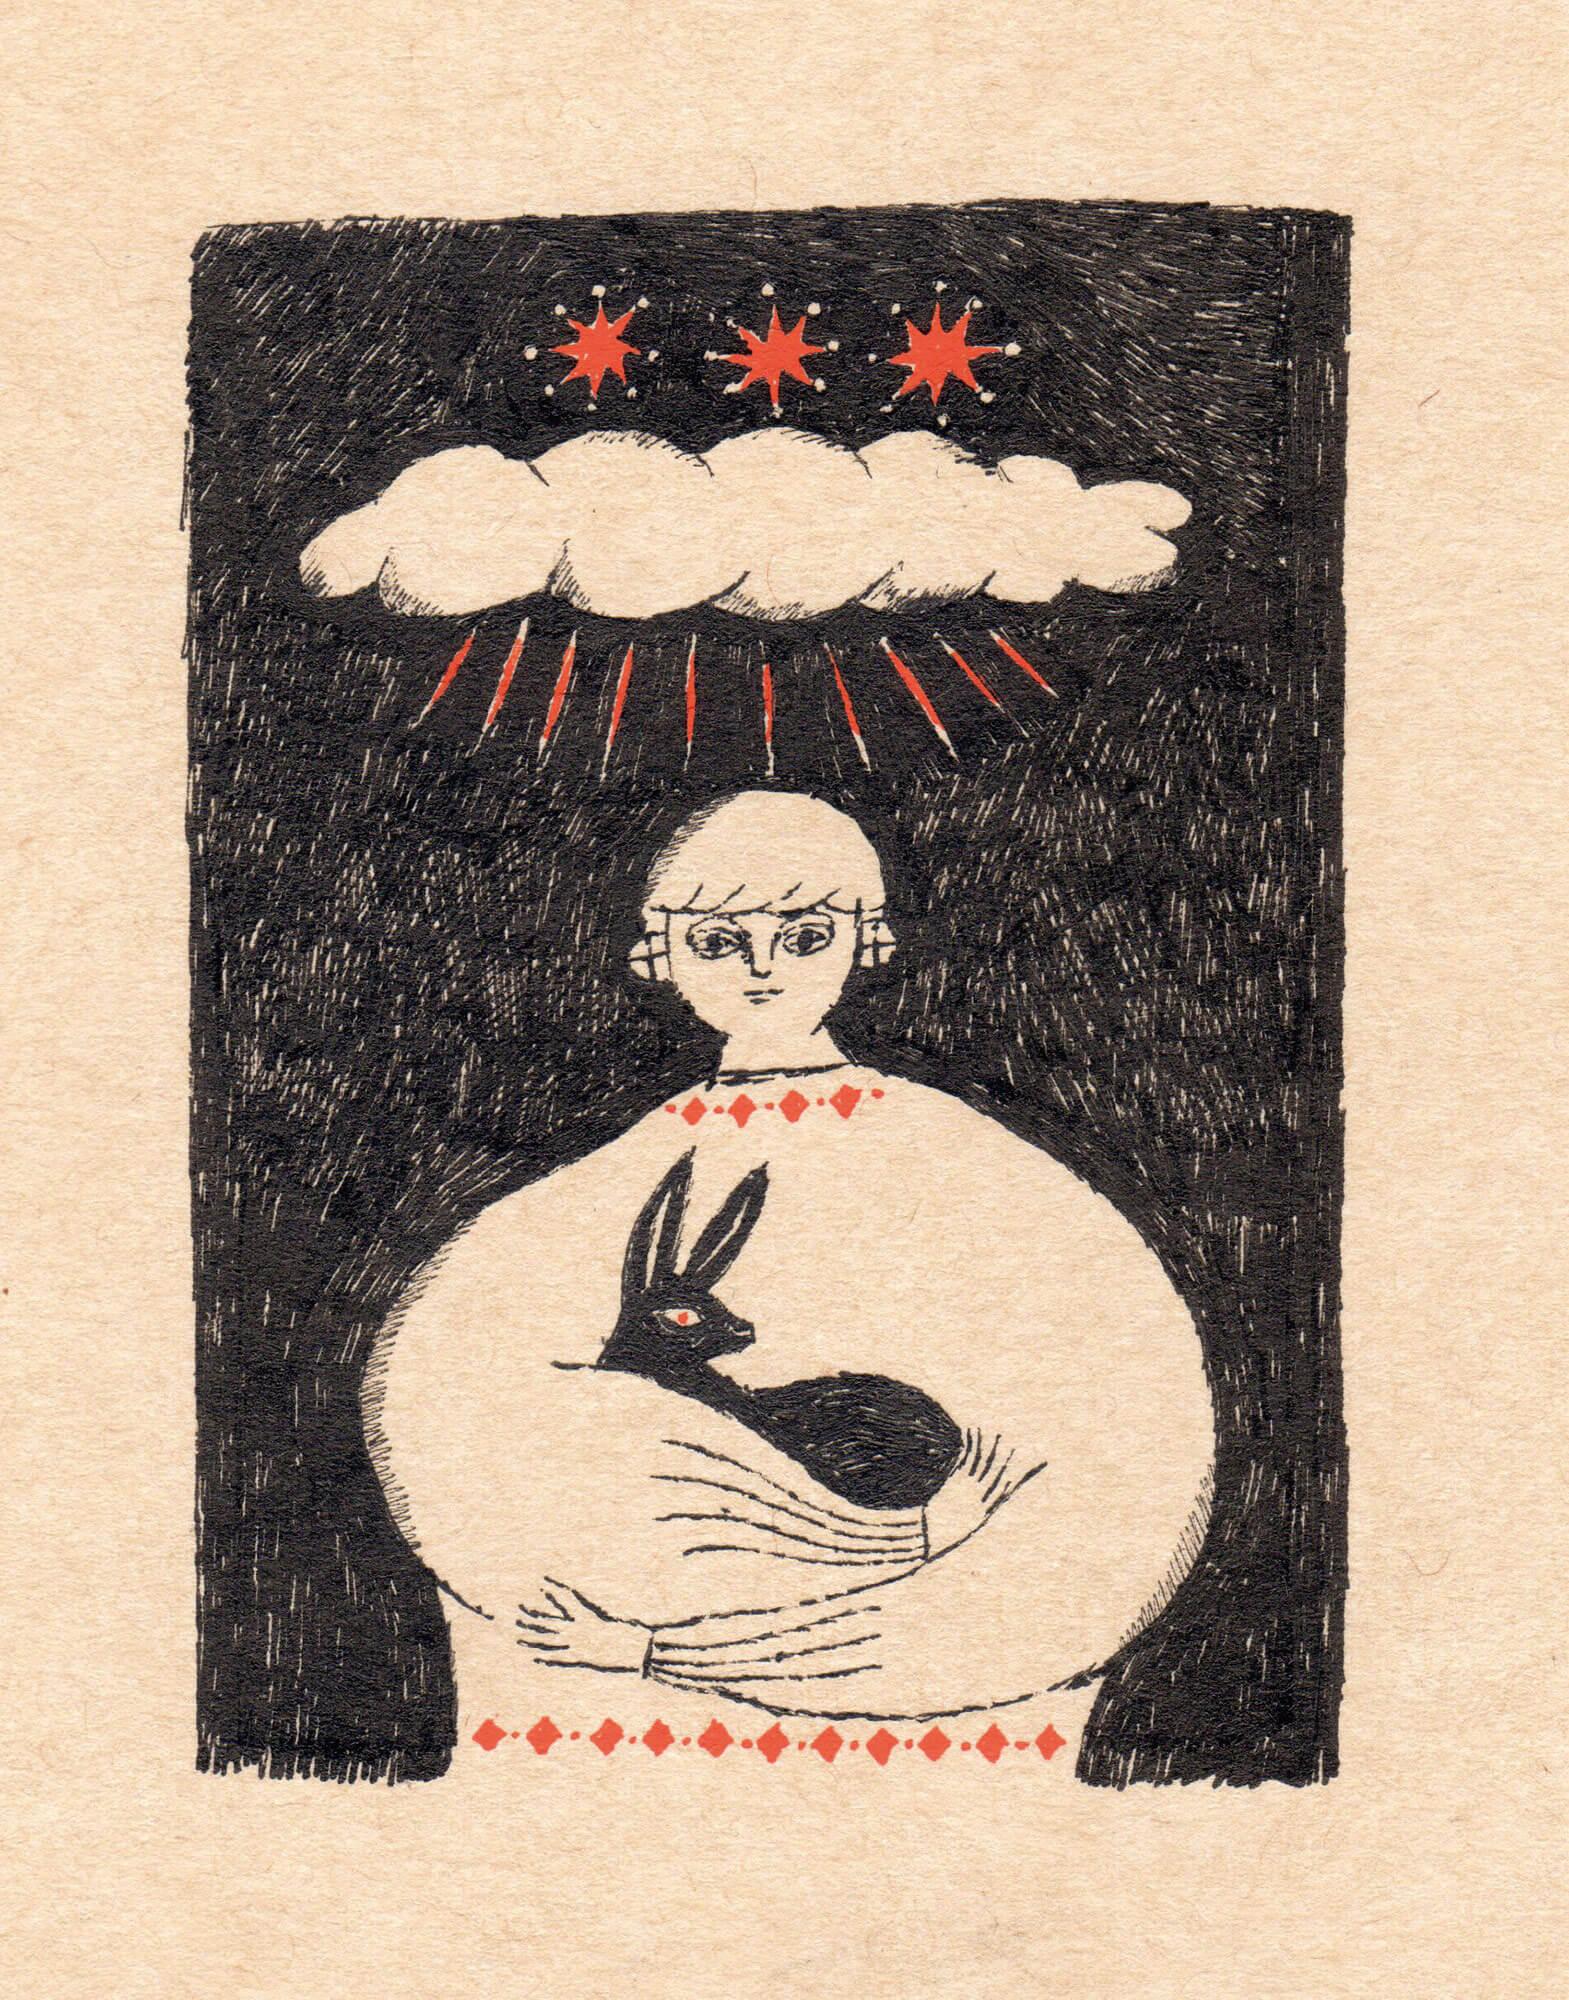 Sanae Sugimoto 「夕べの雲」